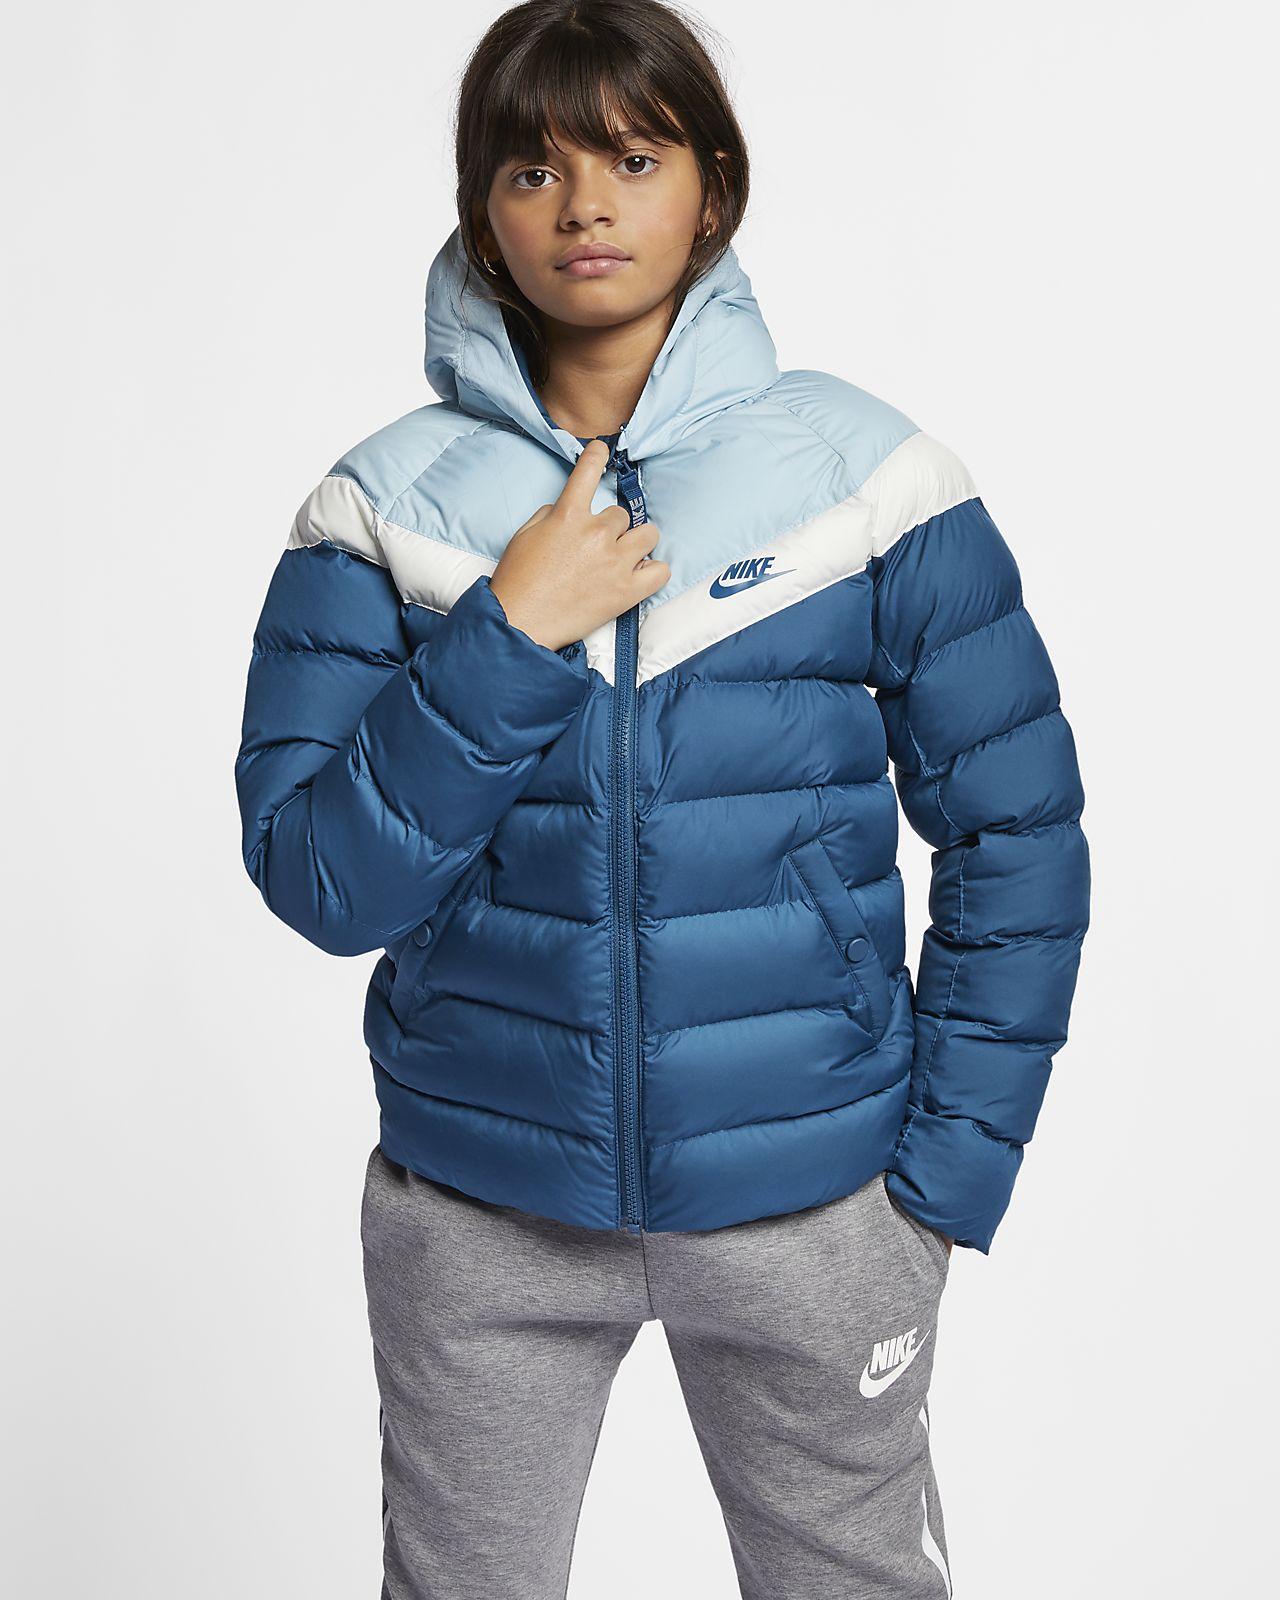 Jacka Nike Sportswear Synthetic Fill för ungdom